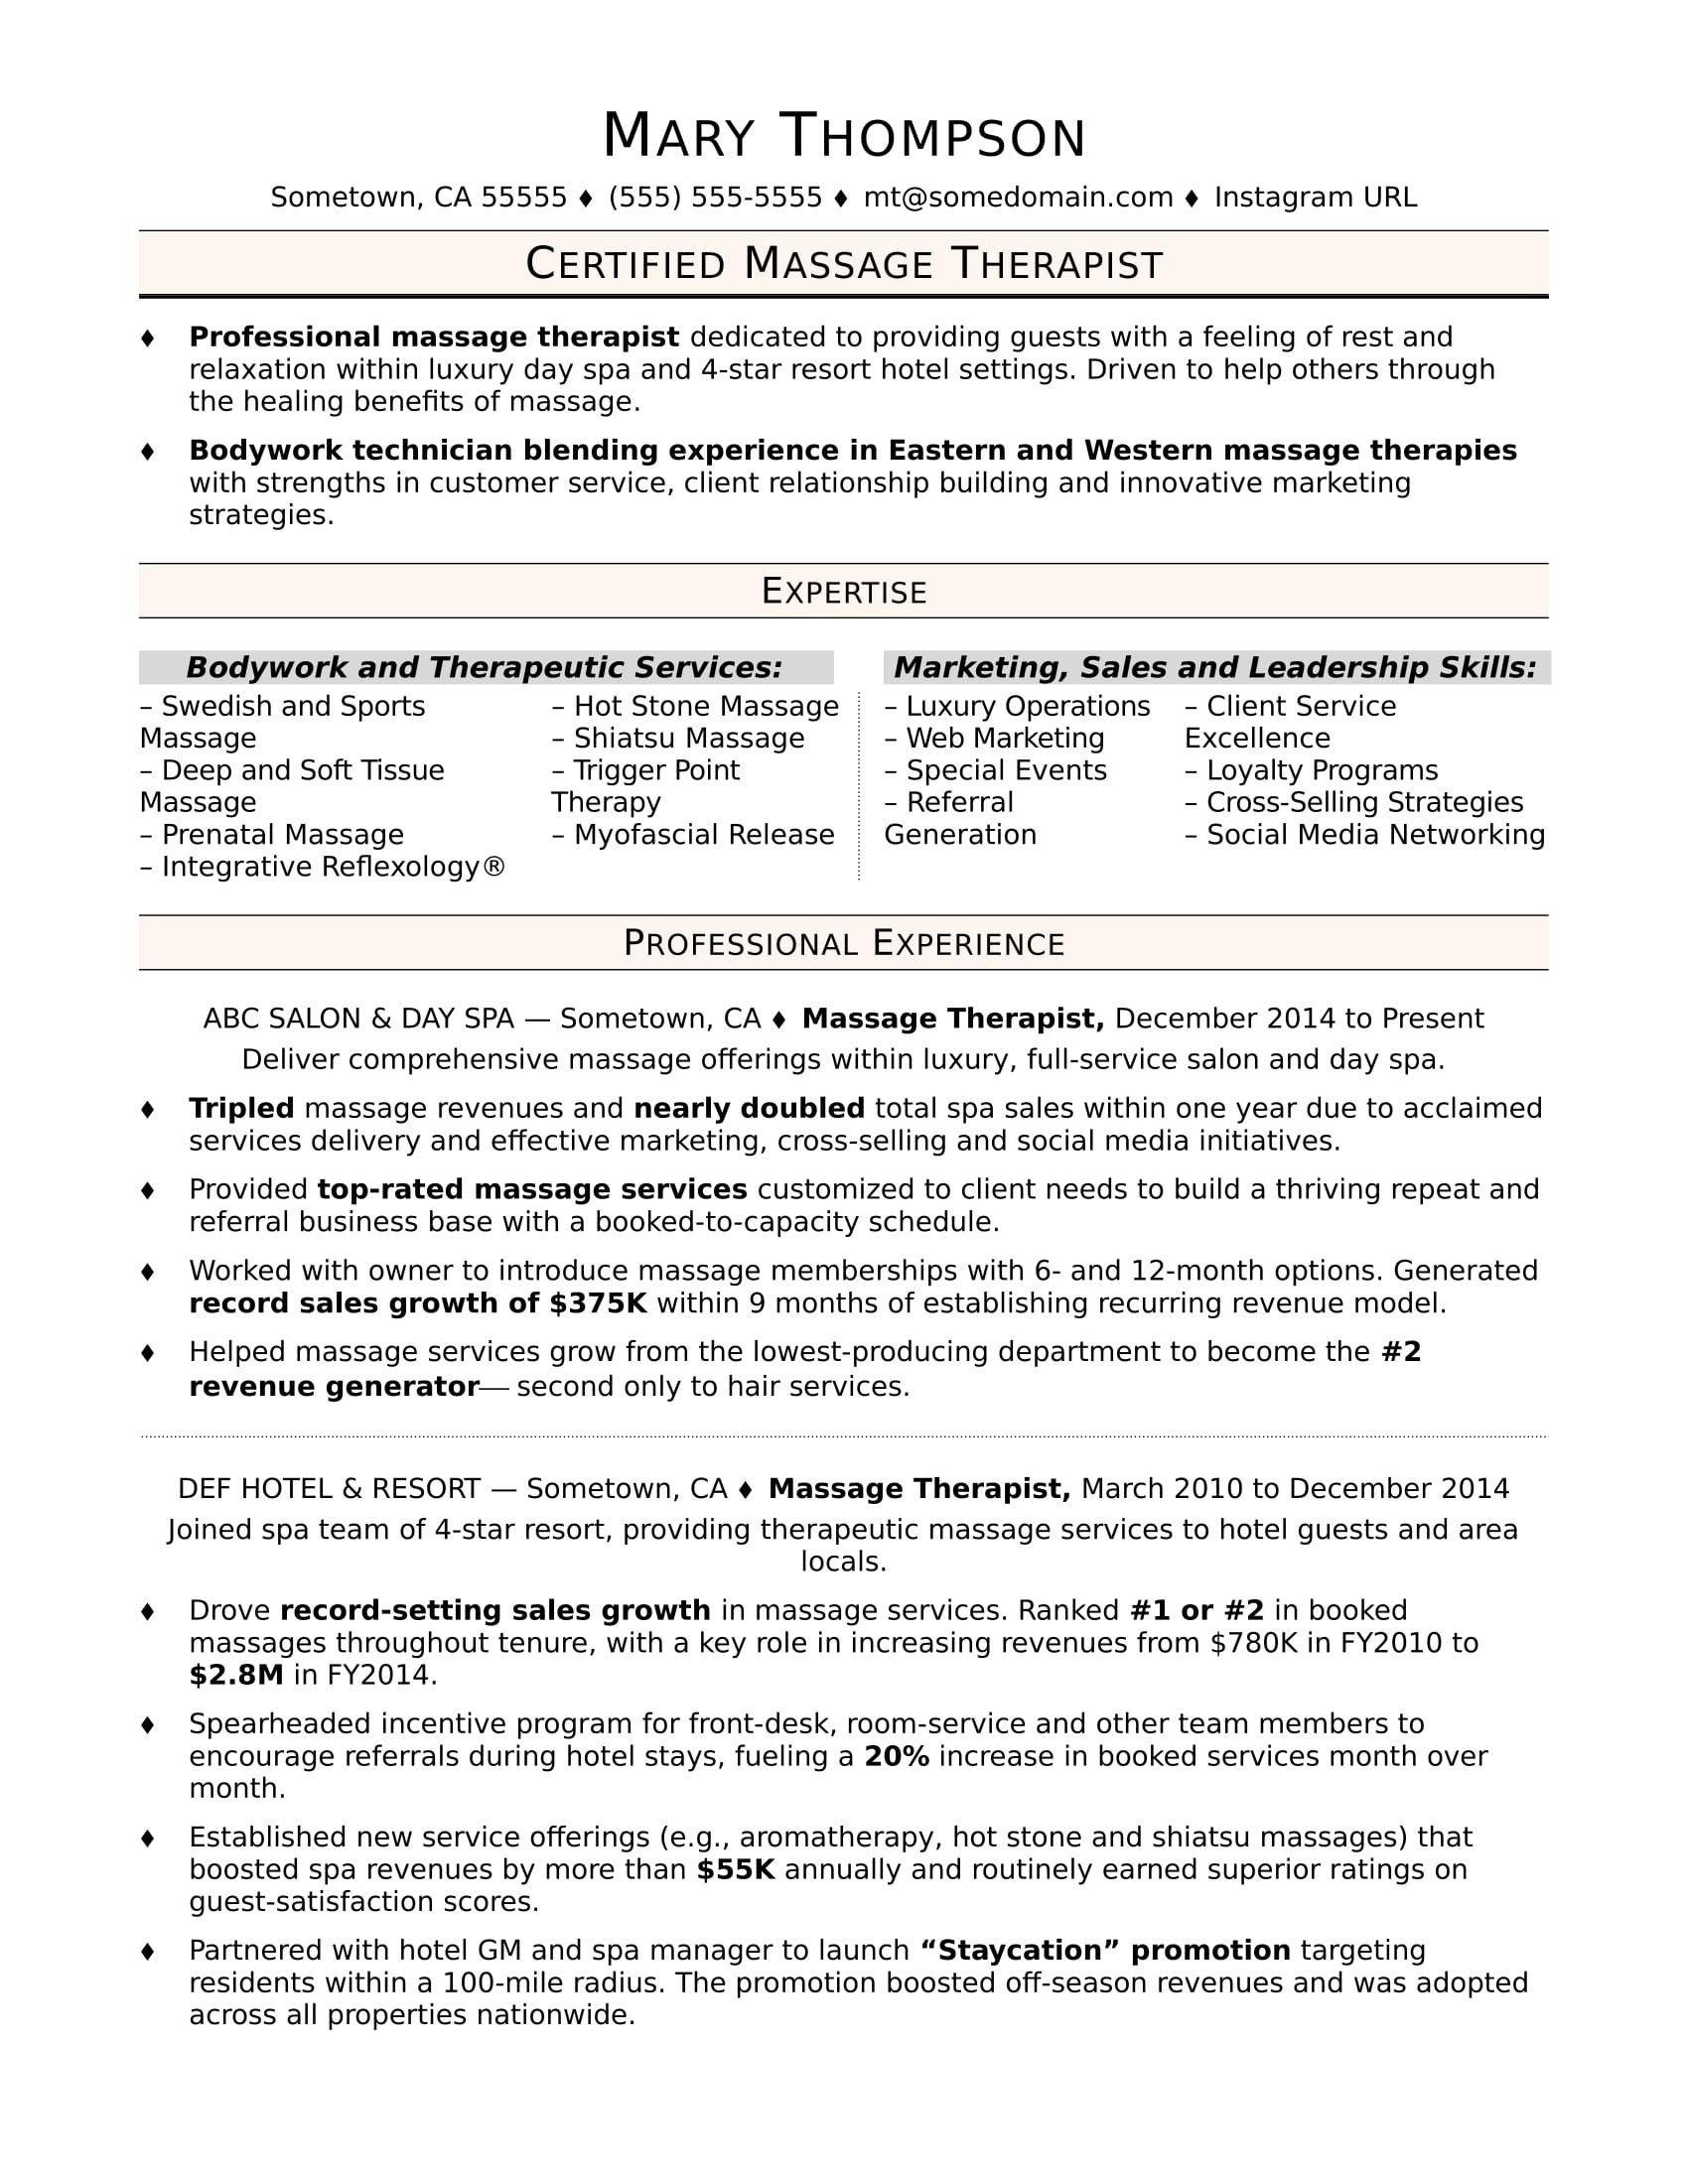 massage therapist resume cover letter